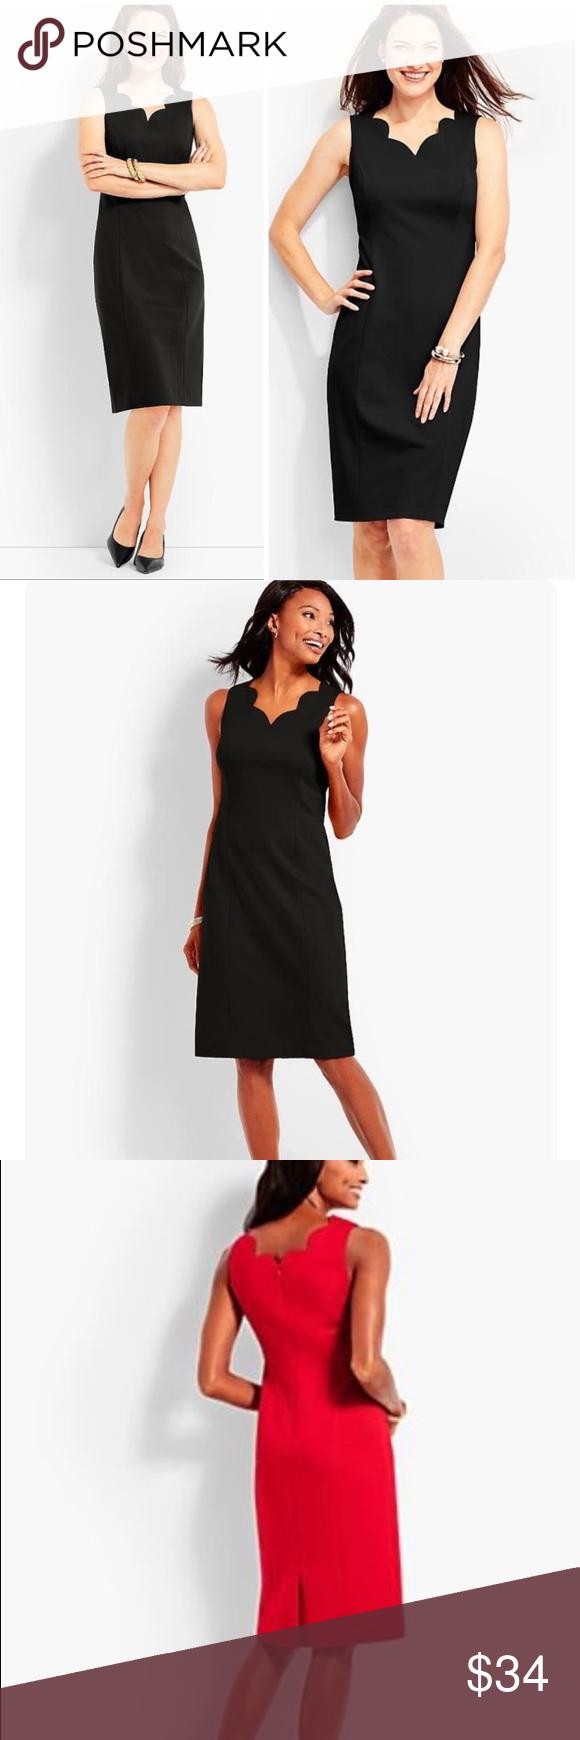 Hp Talbots Black Scallop Vneck Ponte Sheath Dress Maxi Dress With Sleeves Lace Blue Dress Sheath Dress [ 1740 x 580 Pixel ]